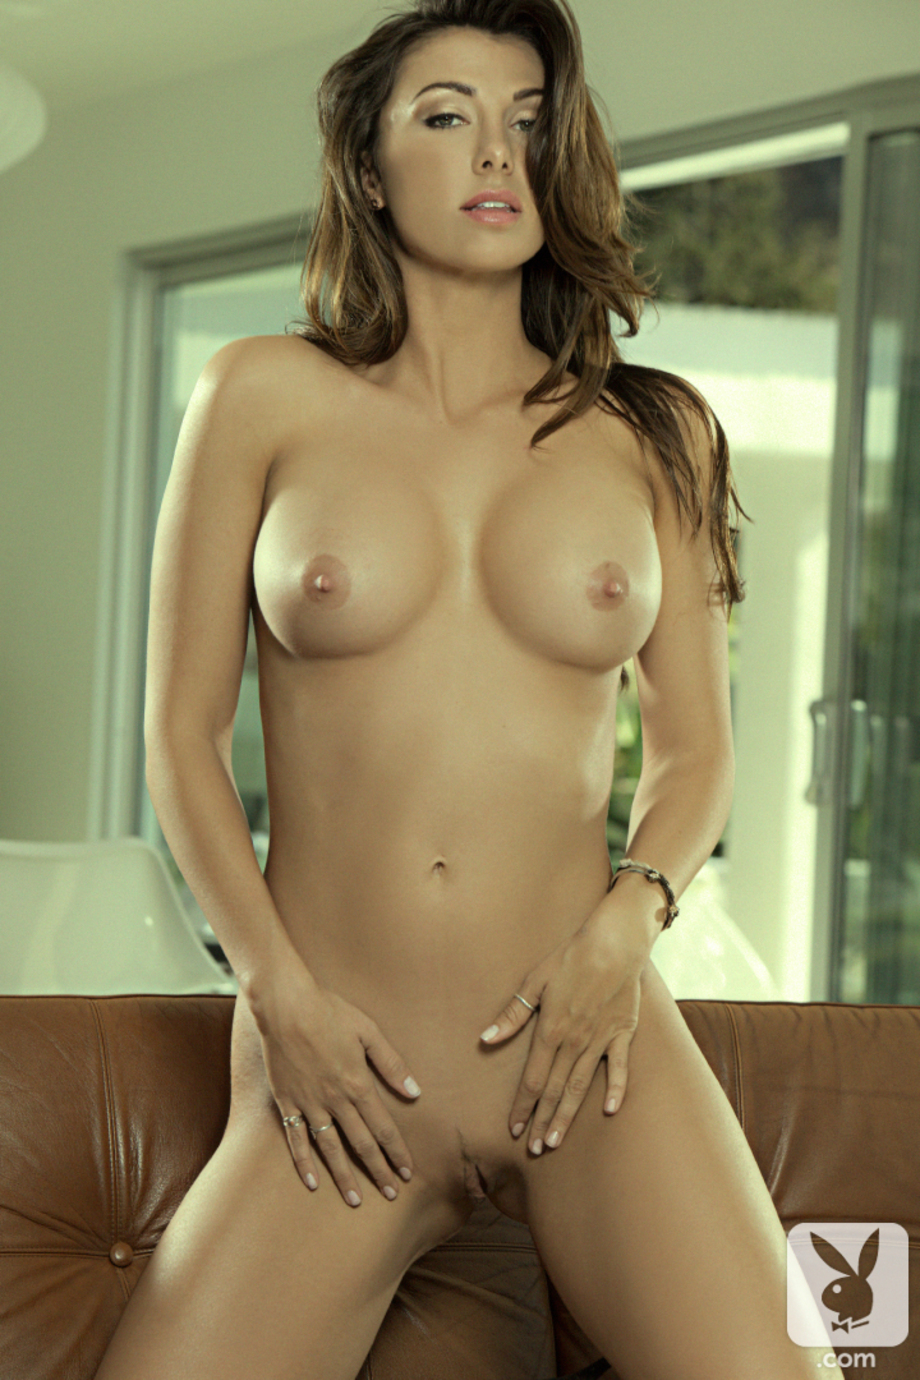 sophia beretta nude pics   5 18 redpornblog